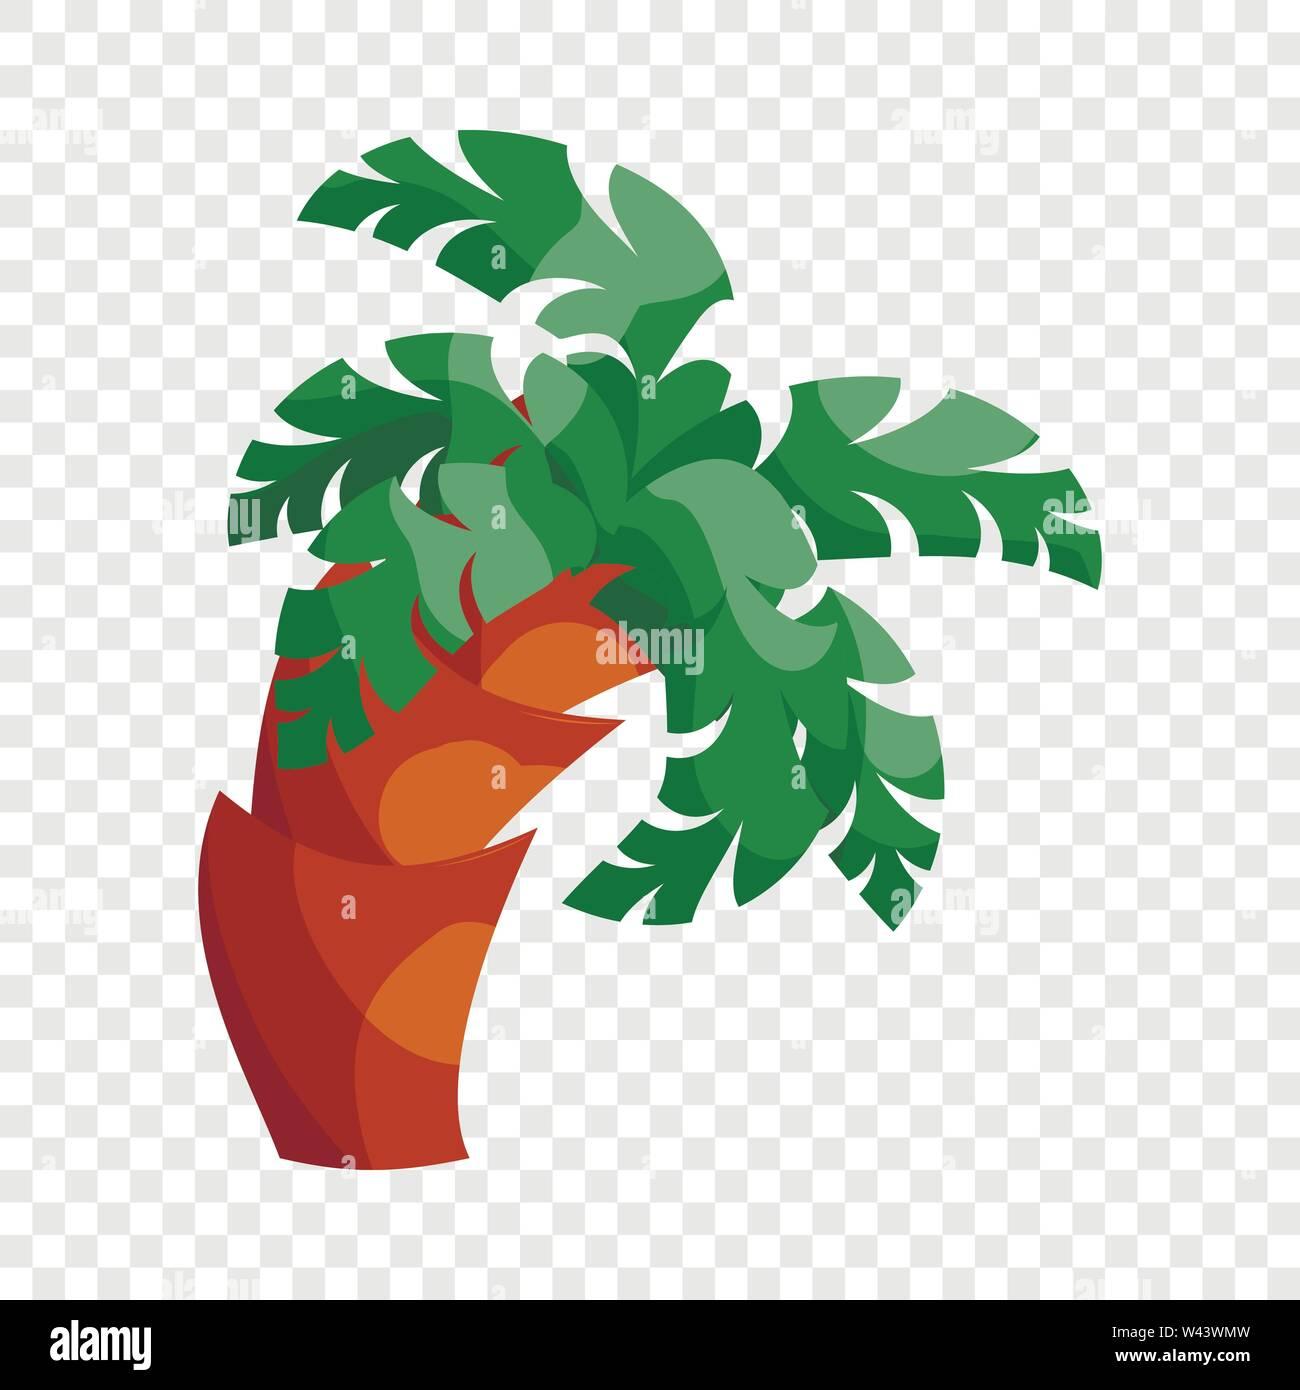 Palm tree icon, cartoon style - Stock Image